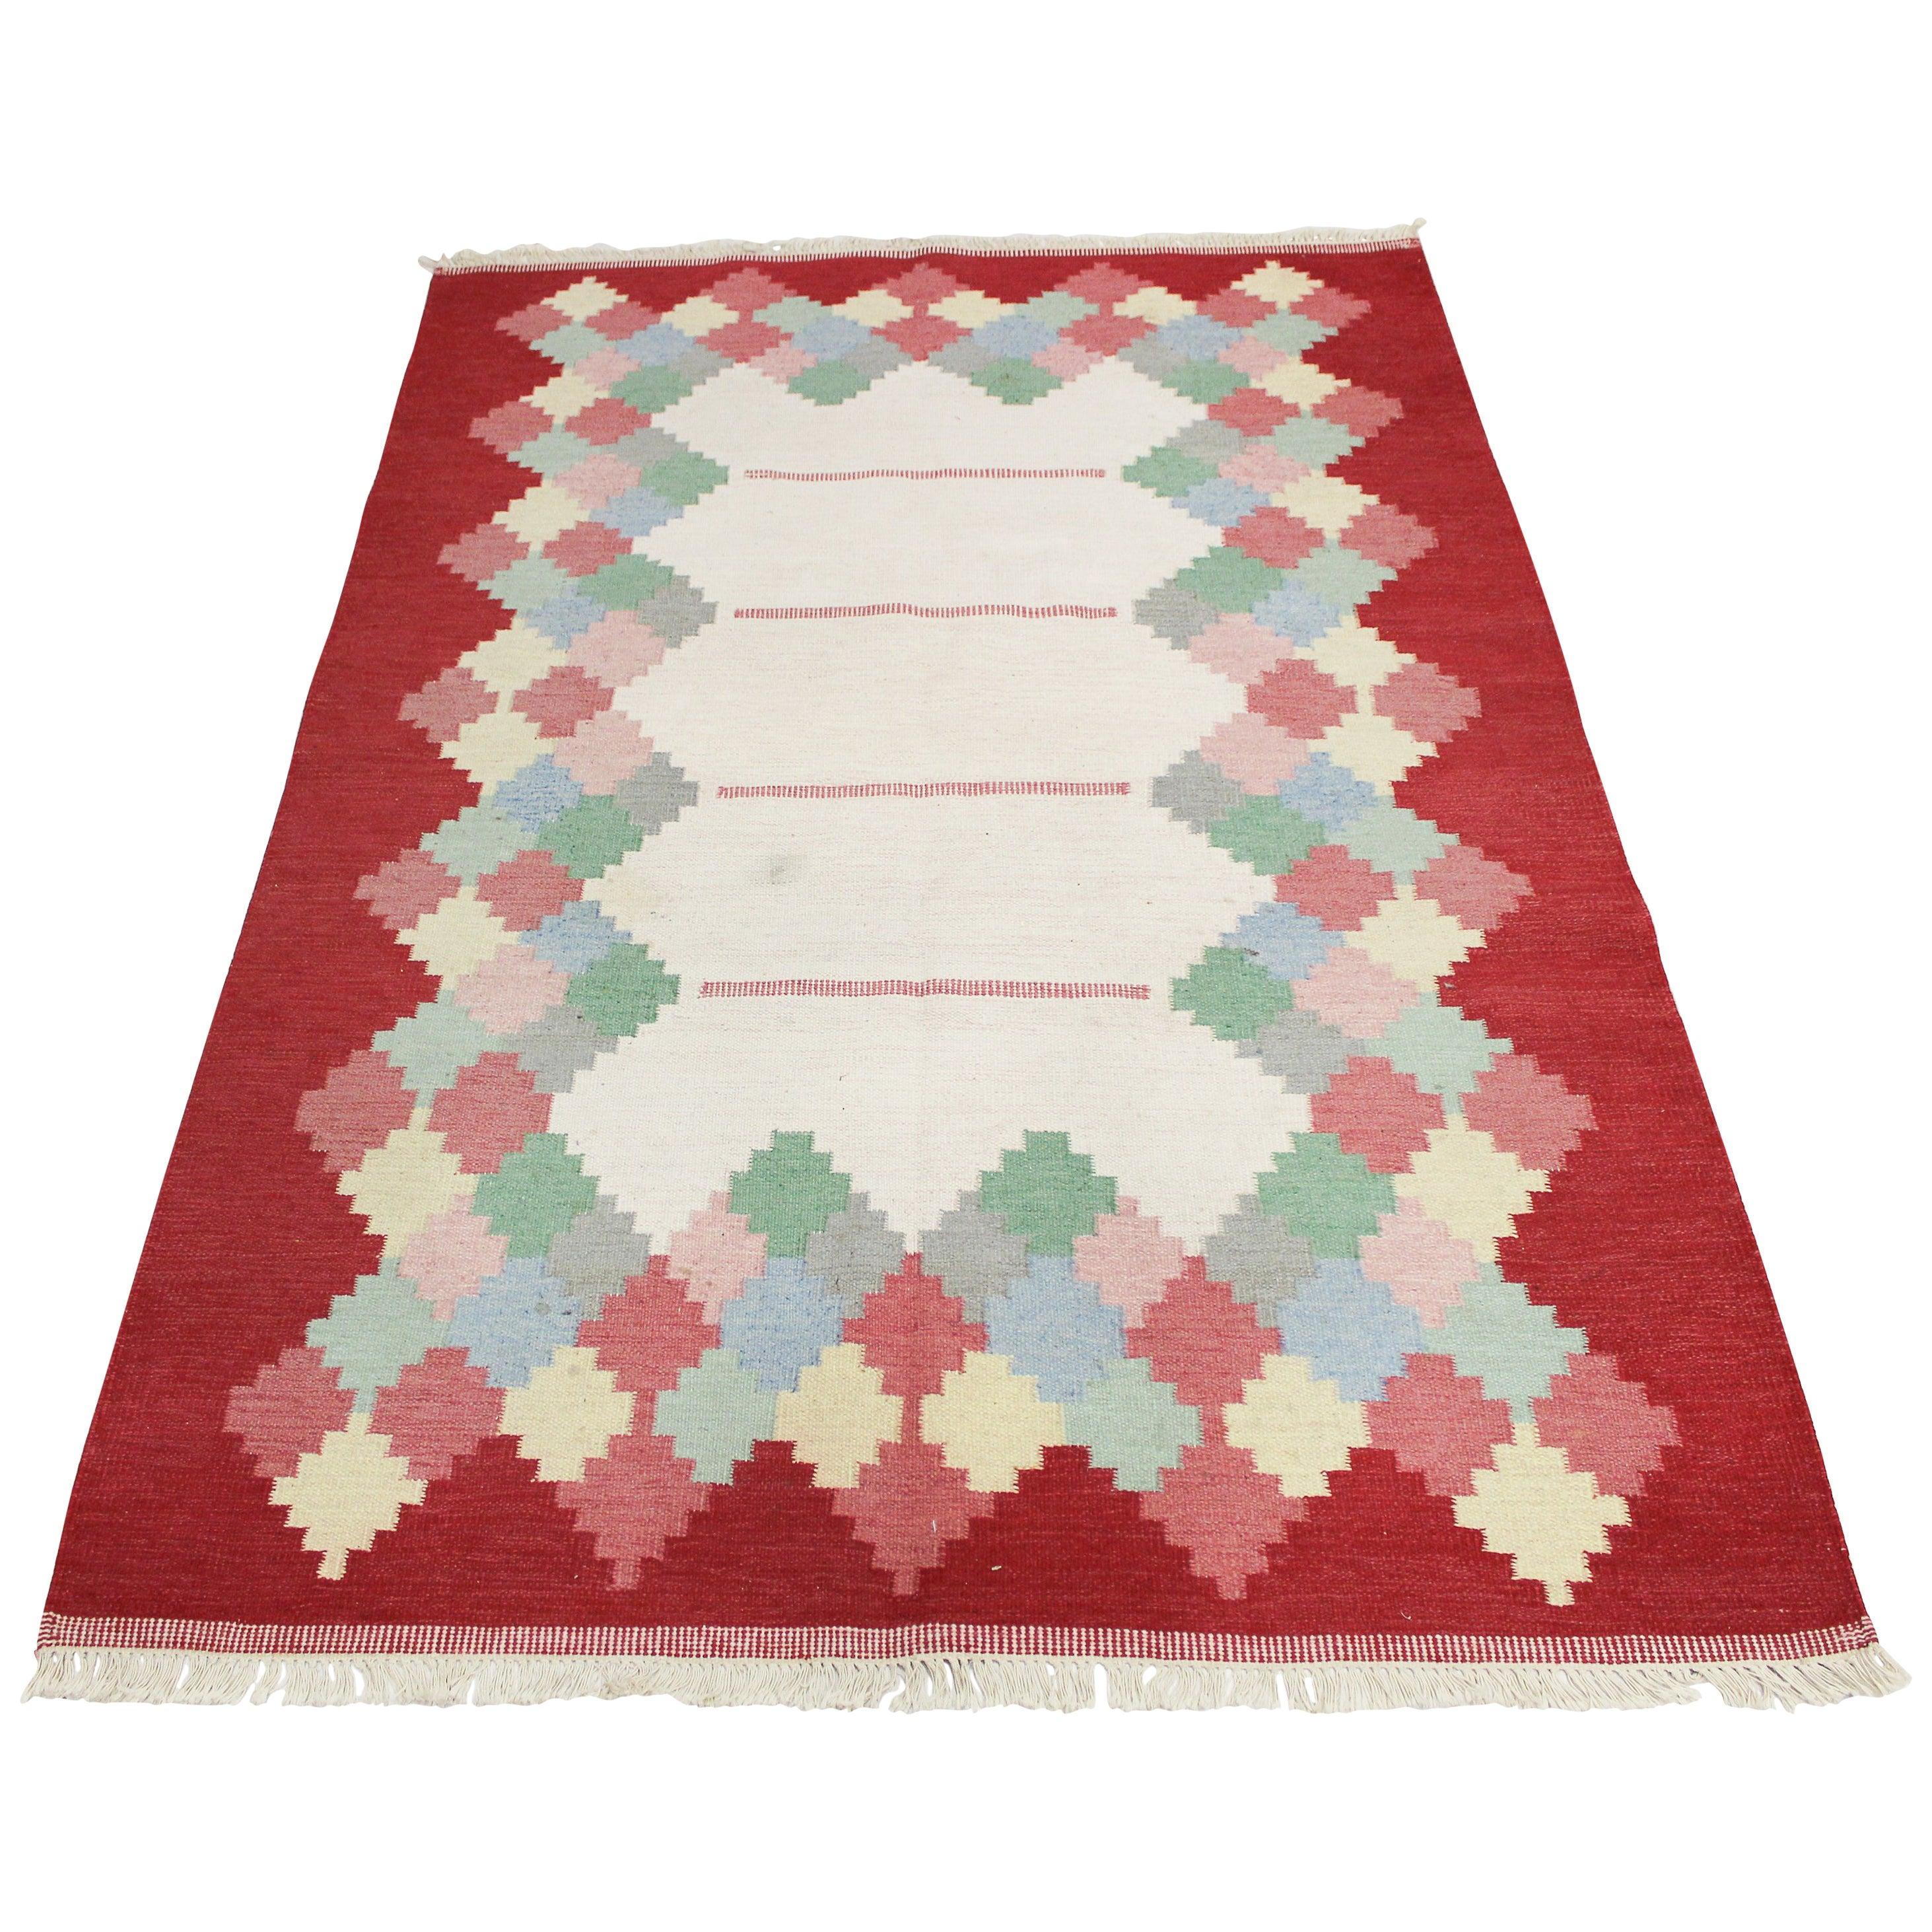 Large Midcentury Swedish Flat Weave Carpet, 1950s